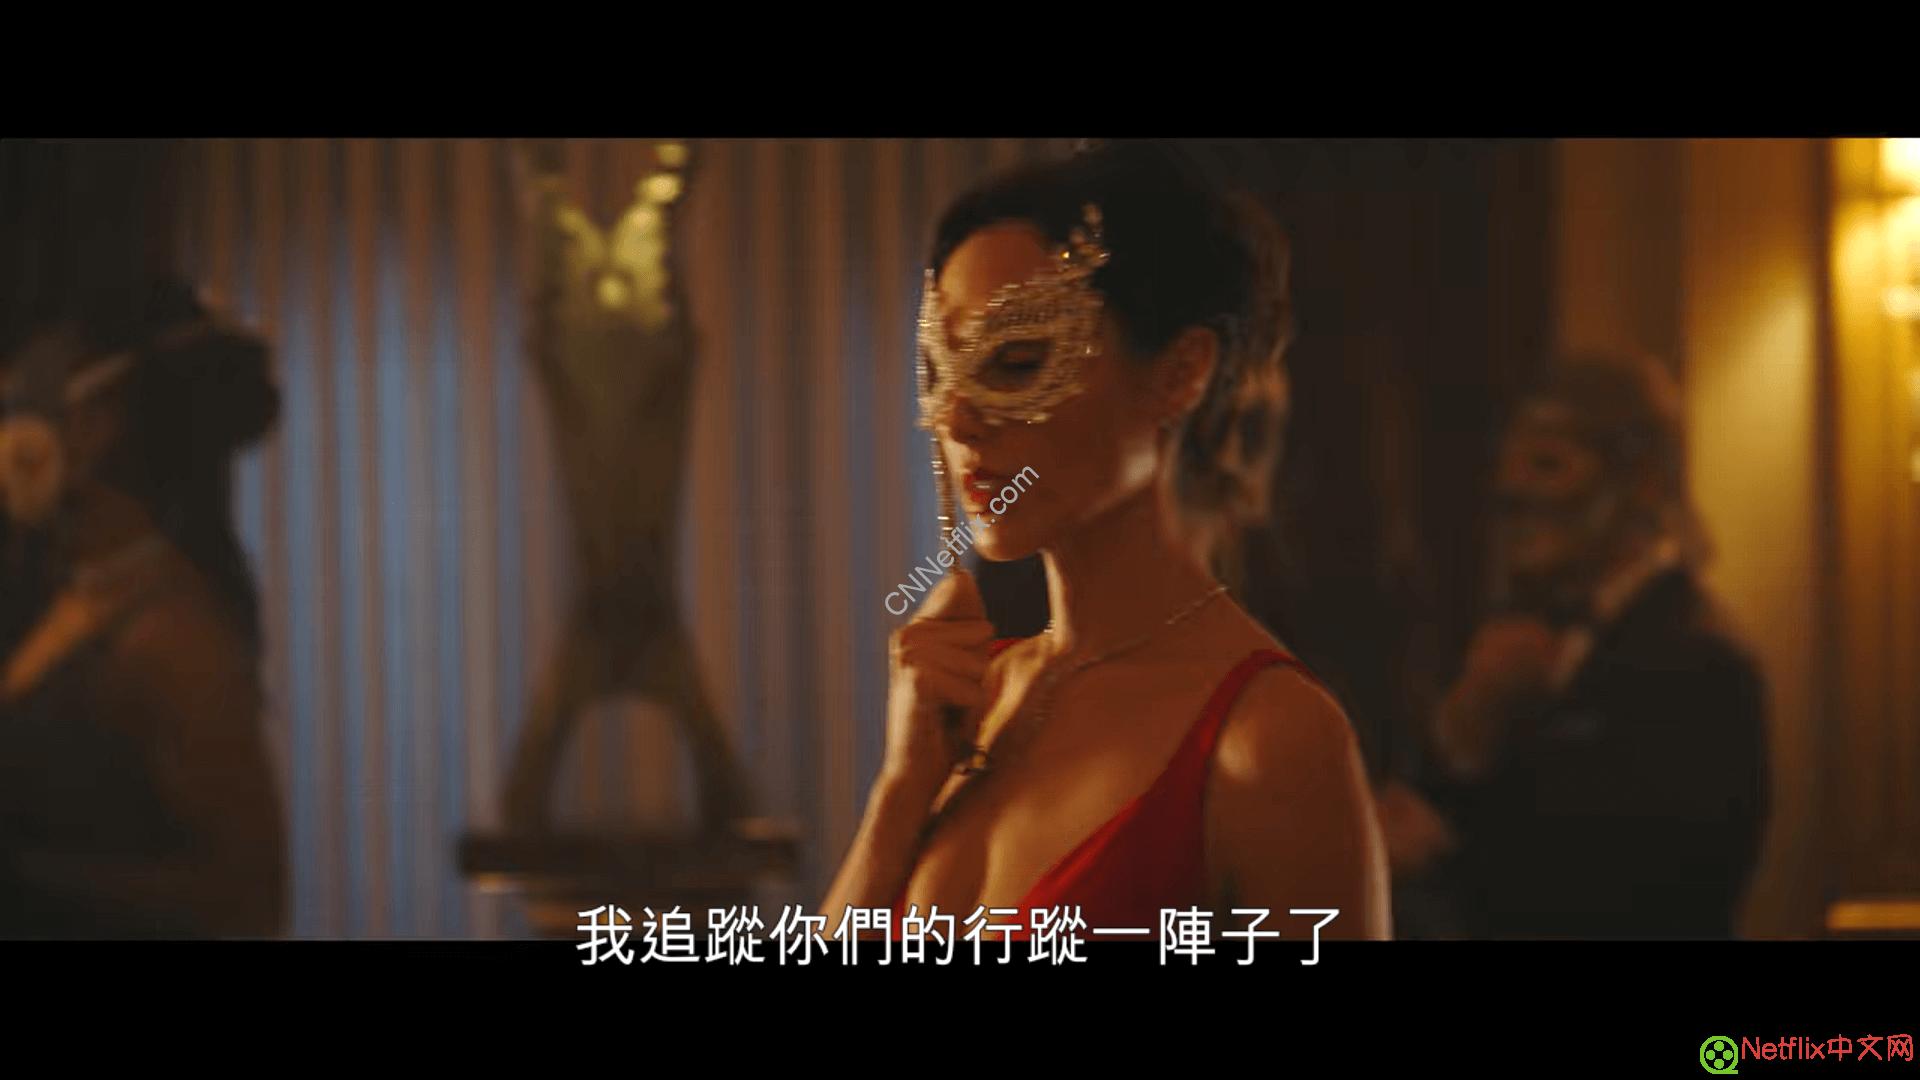 Netflix奈飞《红色通缉令》最新预告, 上映日期11月12日